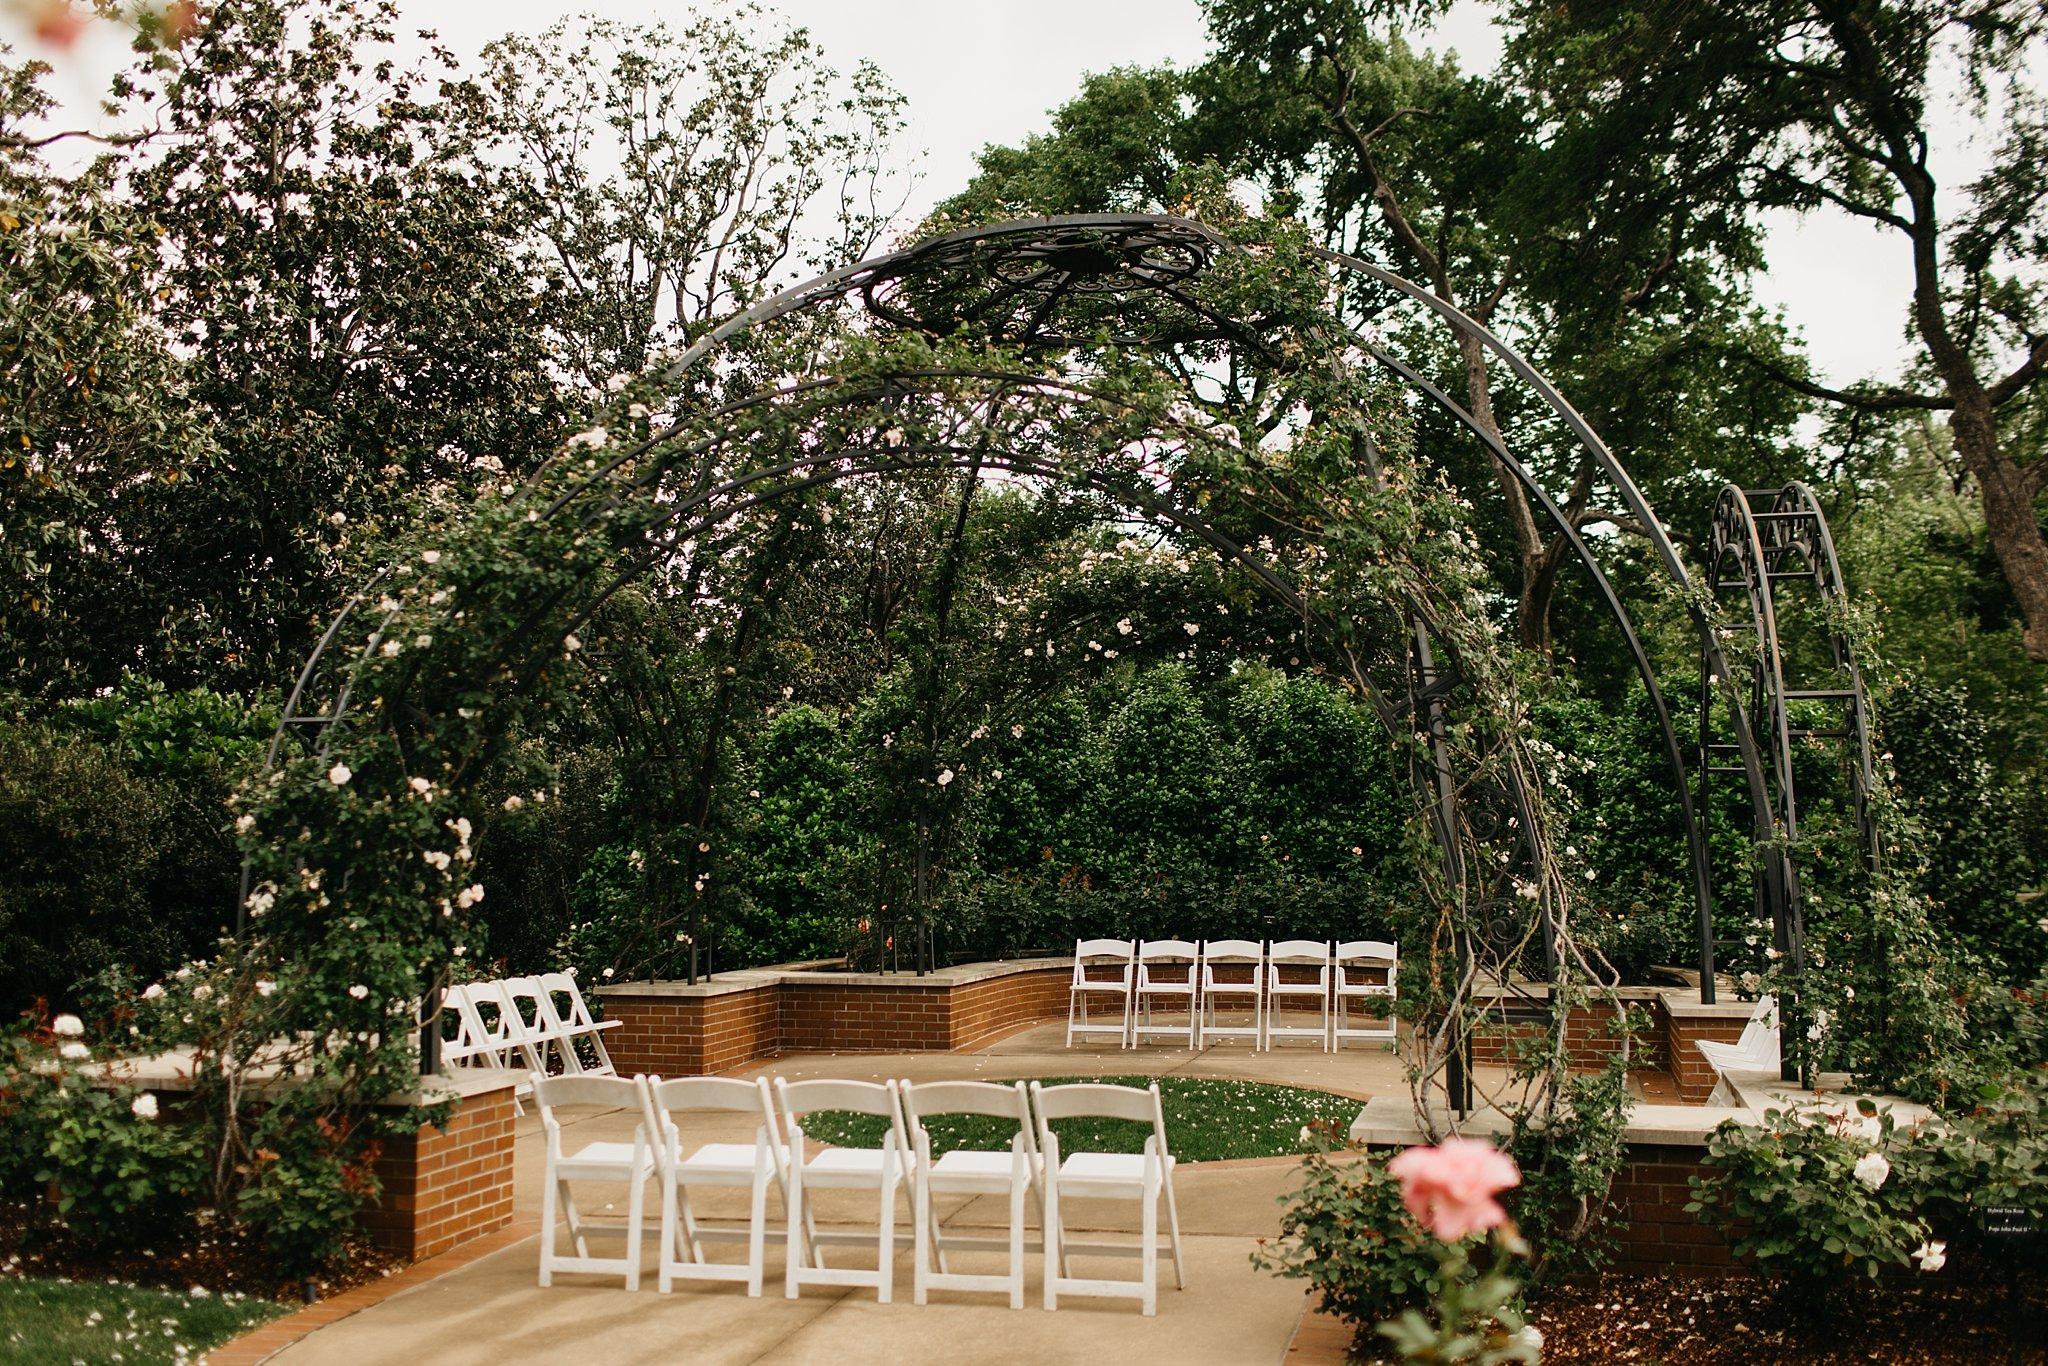 Wilderlove Co_Dallas Texas_Wedding Elopement_Arboretum_Photography_0001.jpg